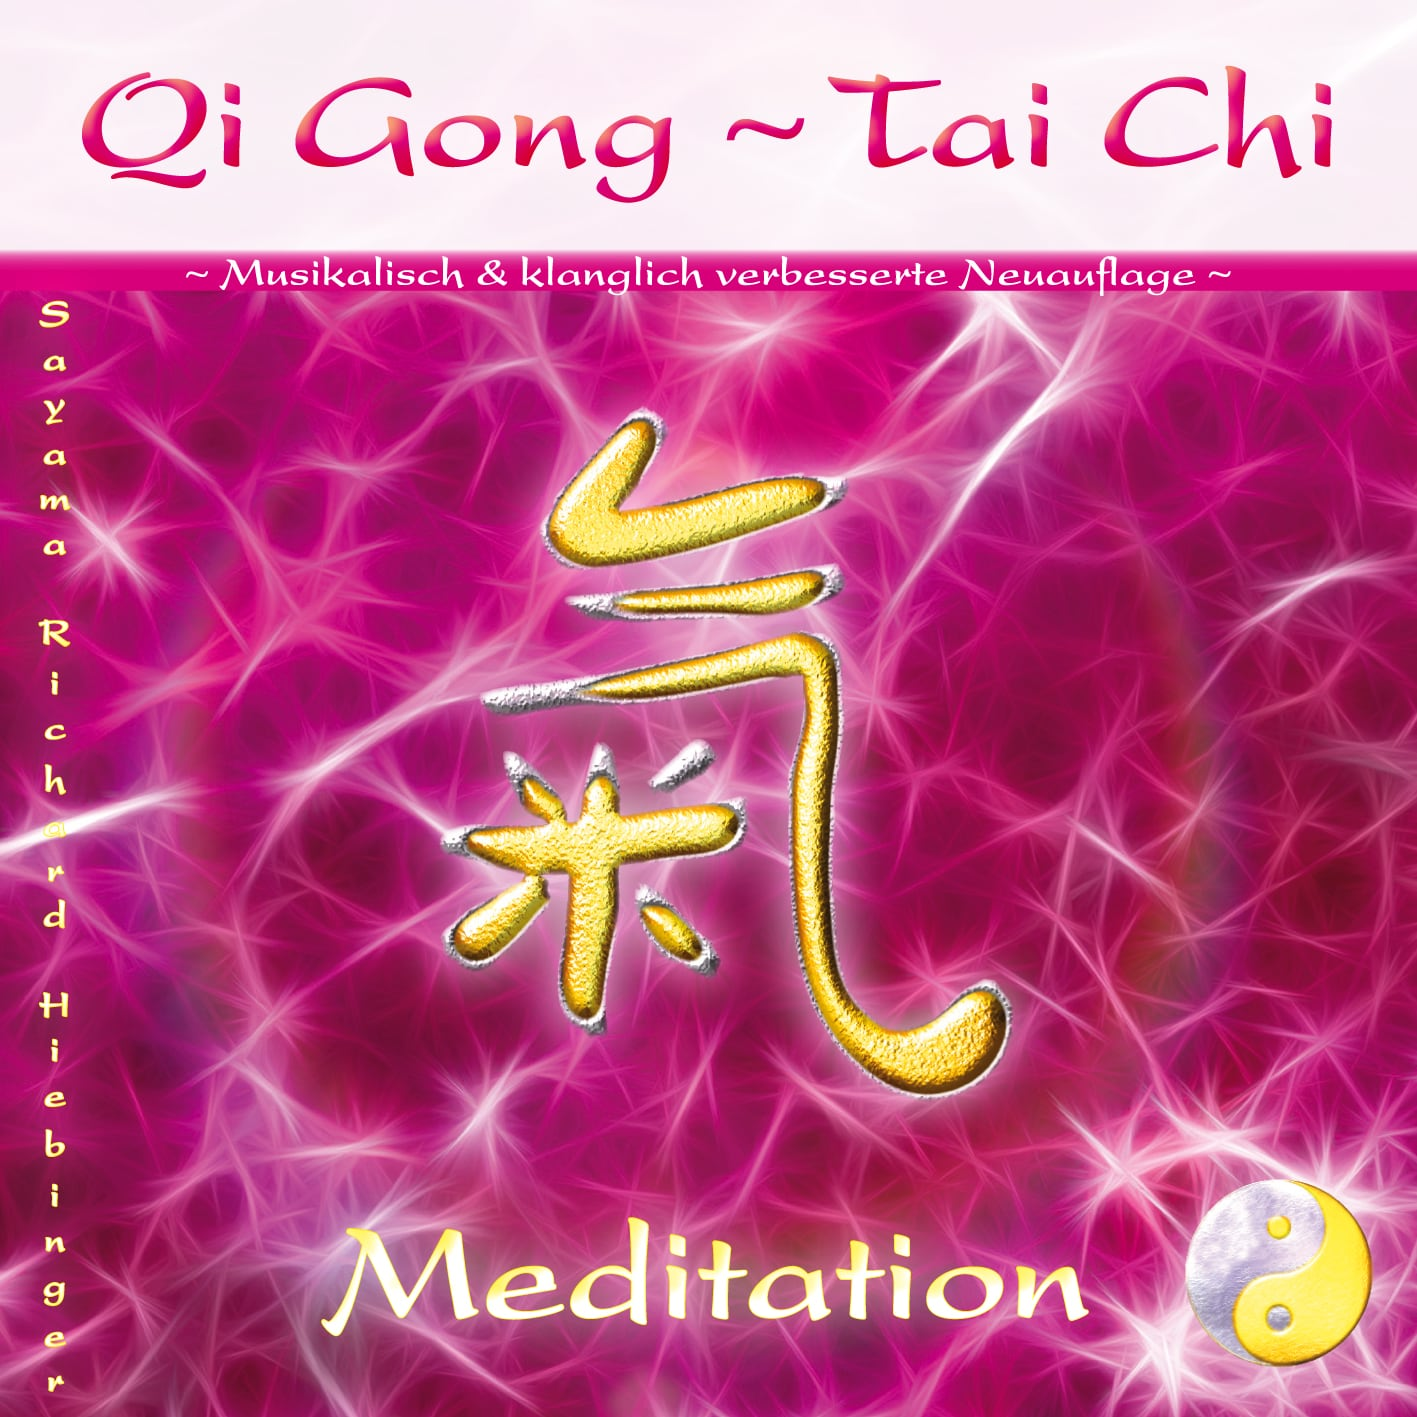 CD Titelbild Qi Gong ~ Tai Chi ~ Meditation von Sayama Music Richard Hiebinger. https://www.sayama-music.de/cds/qi-gong-tai-chi-meditation/